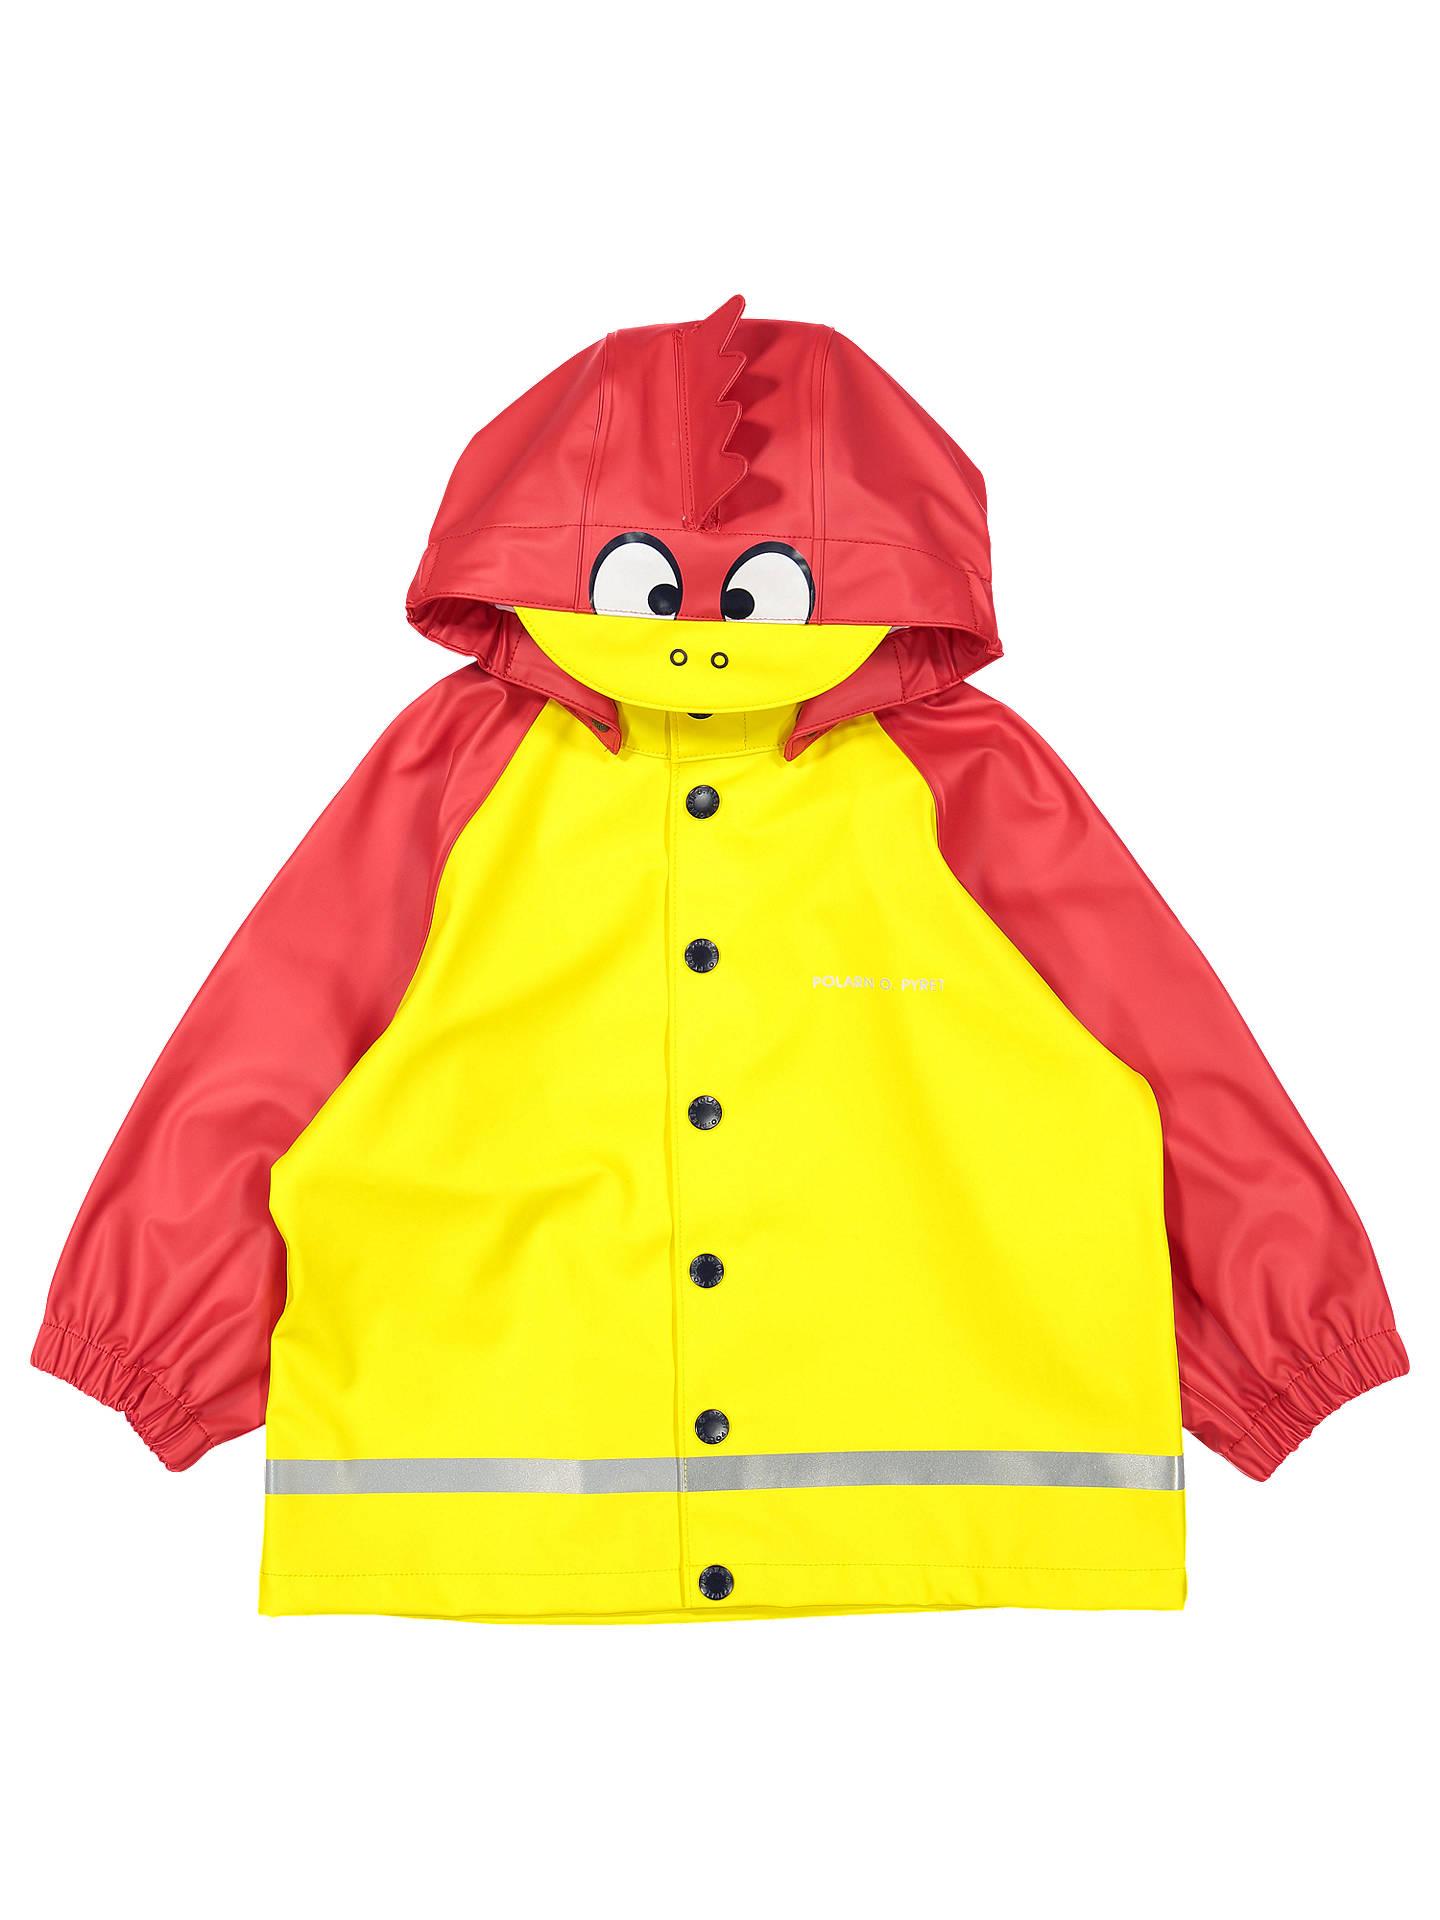 Polarn O Pyret Baby Raincoat Yellow Red 12 24 Months At John Jacket Vacuum Pump Wiring Diagram Buypolarn Online